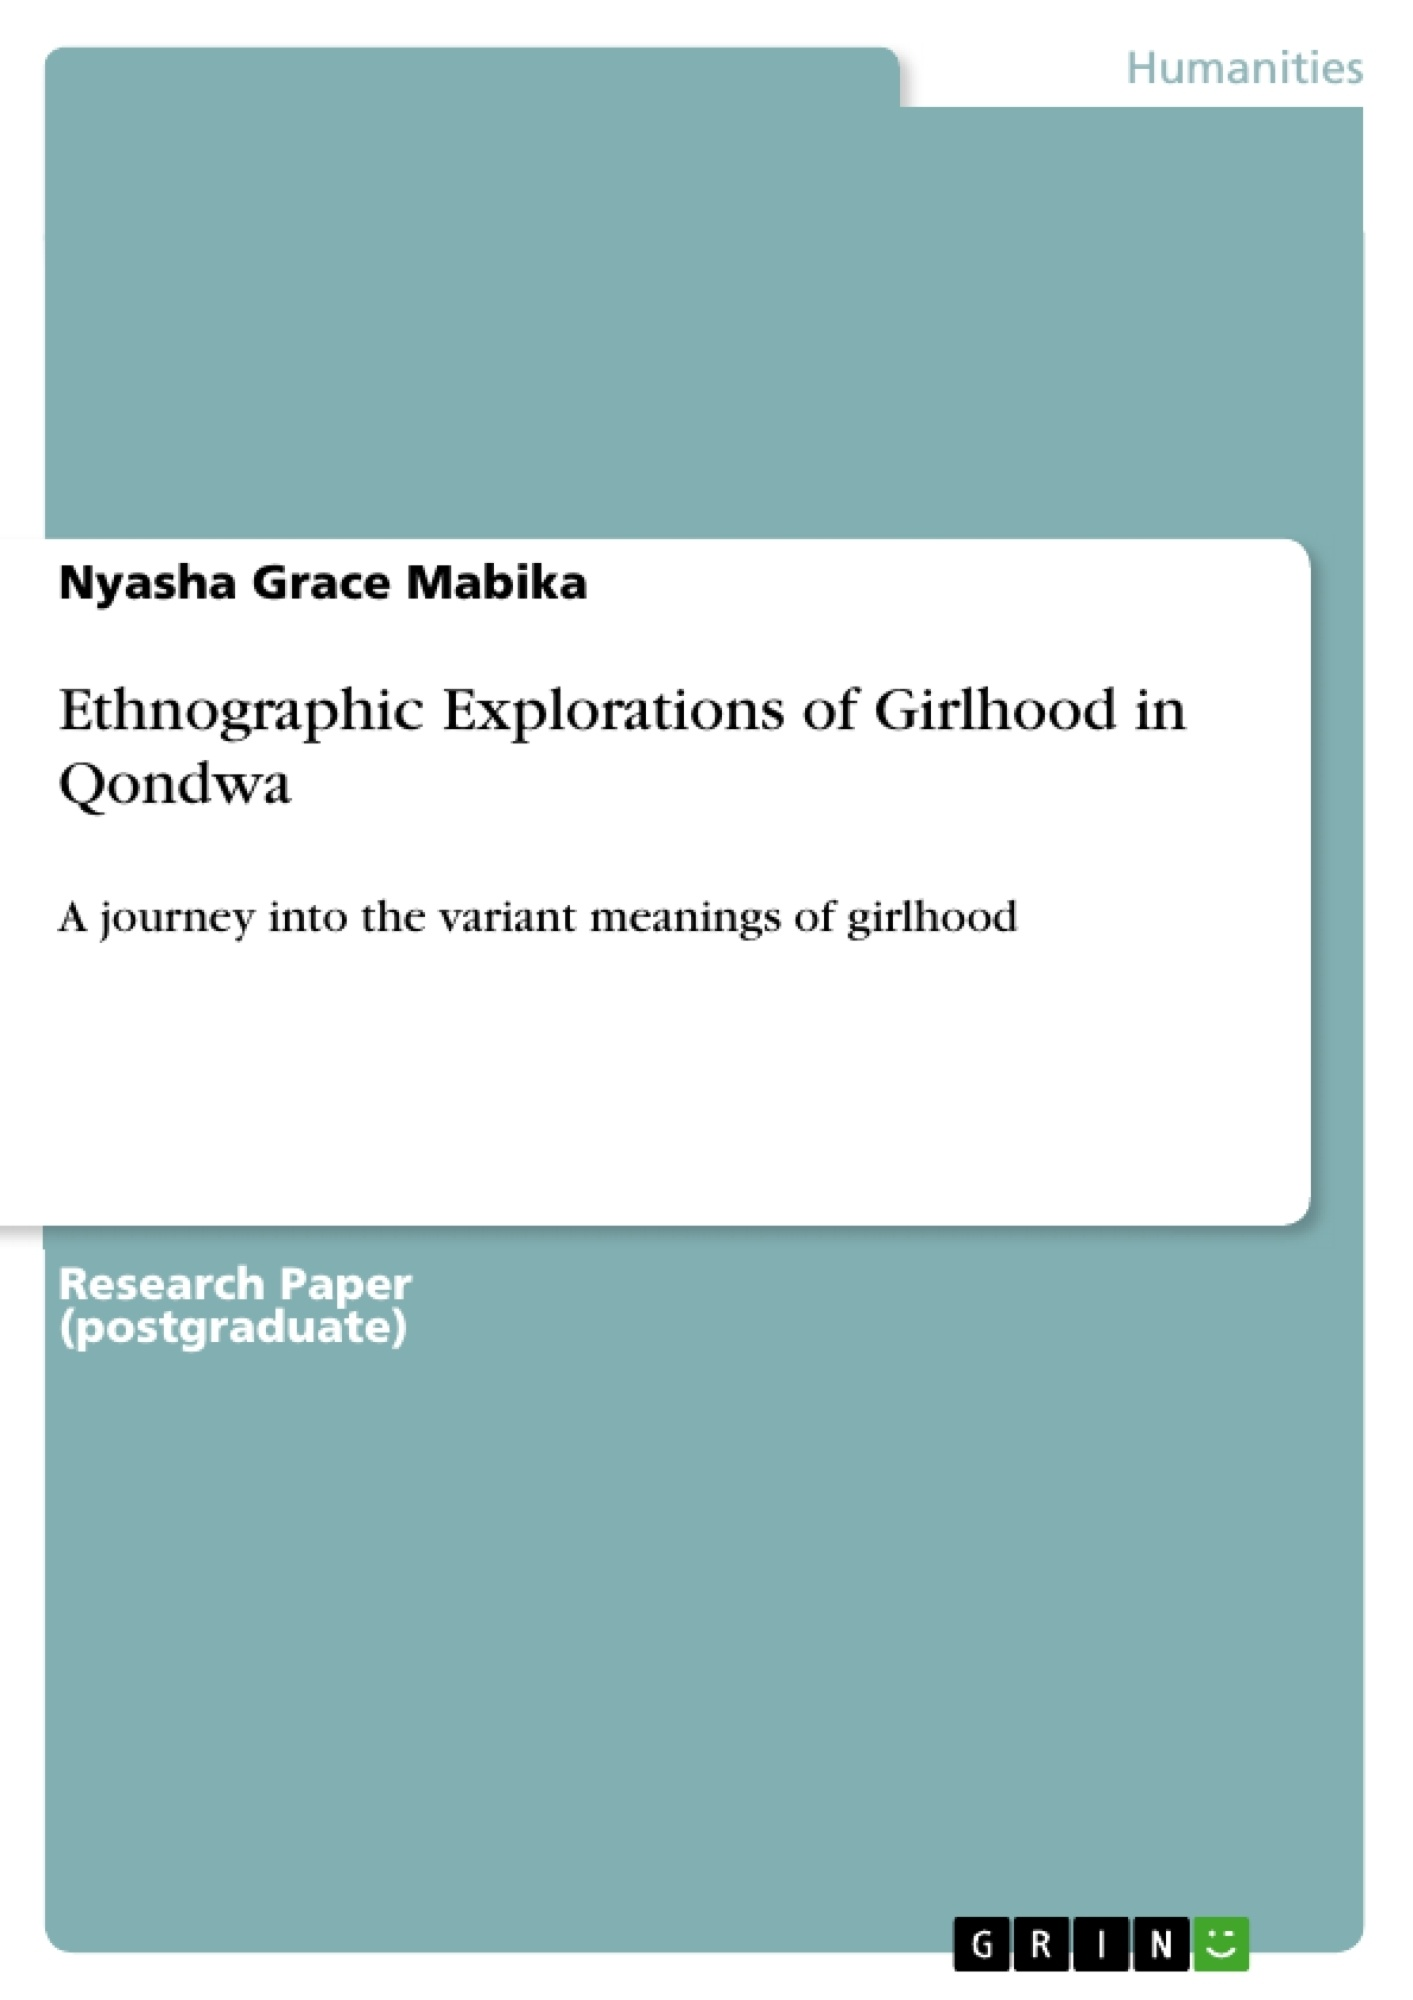 Title: Ethnographic Explorations of Girlhood in Qondwa